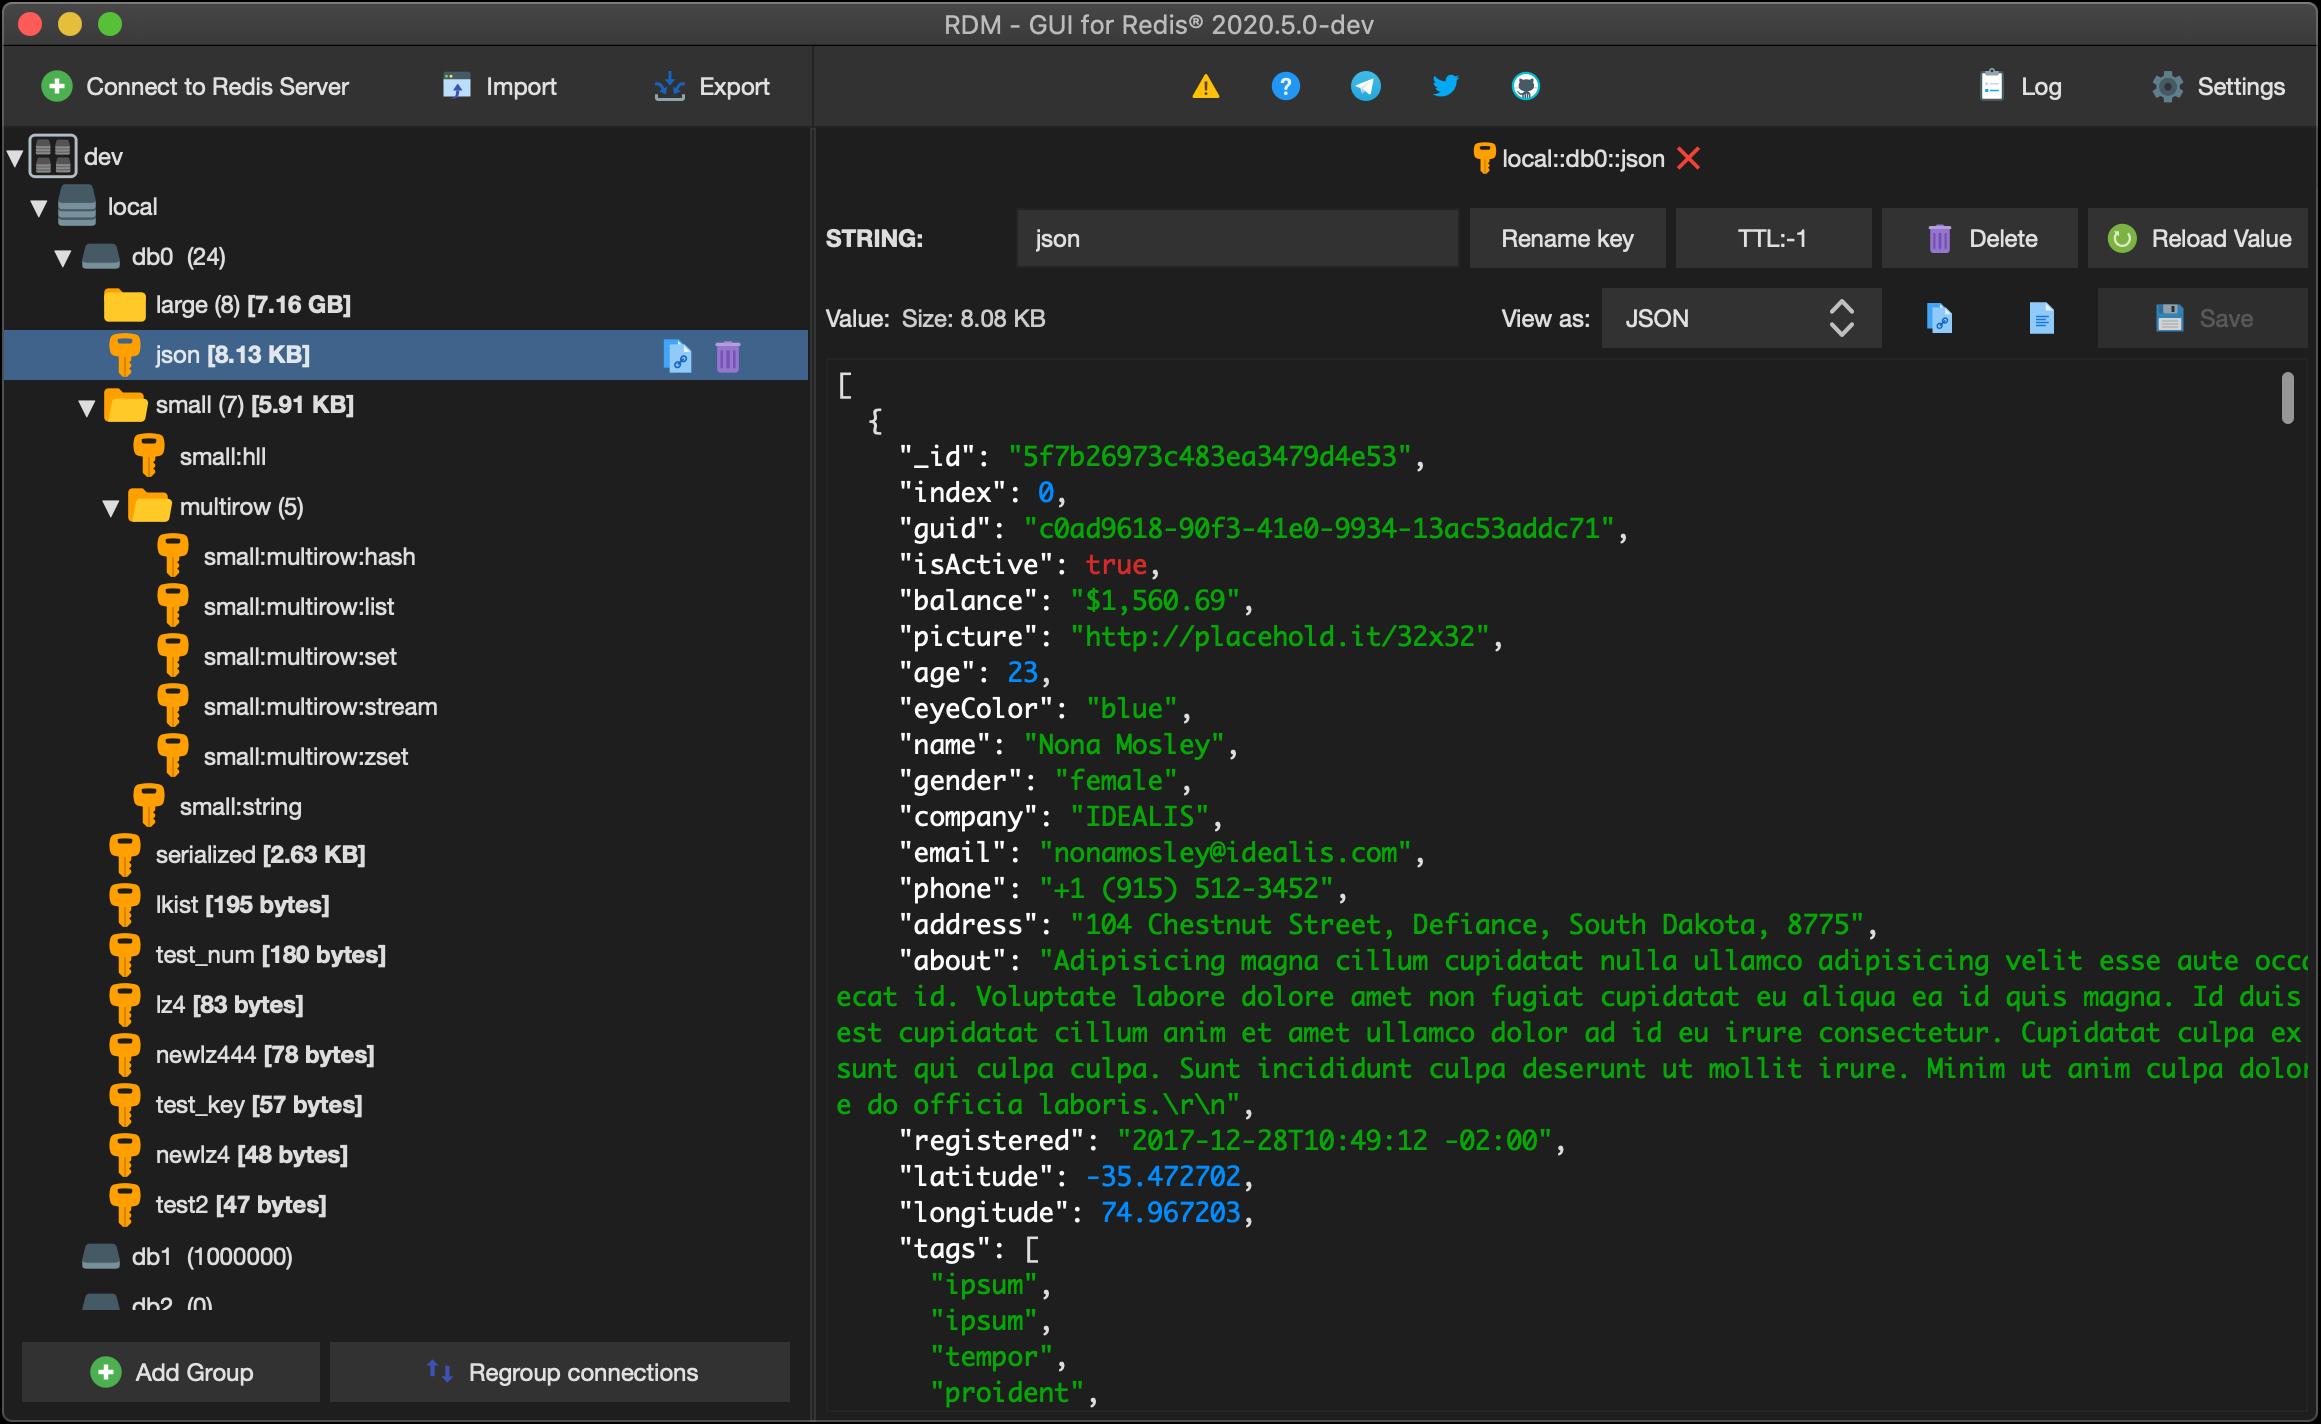 RDM screenshot